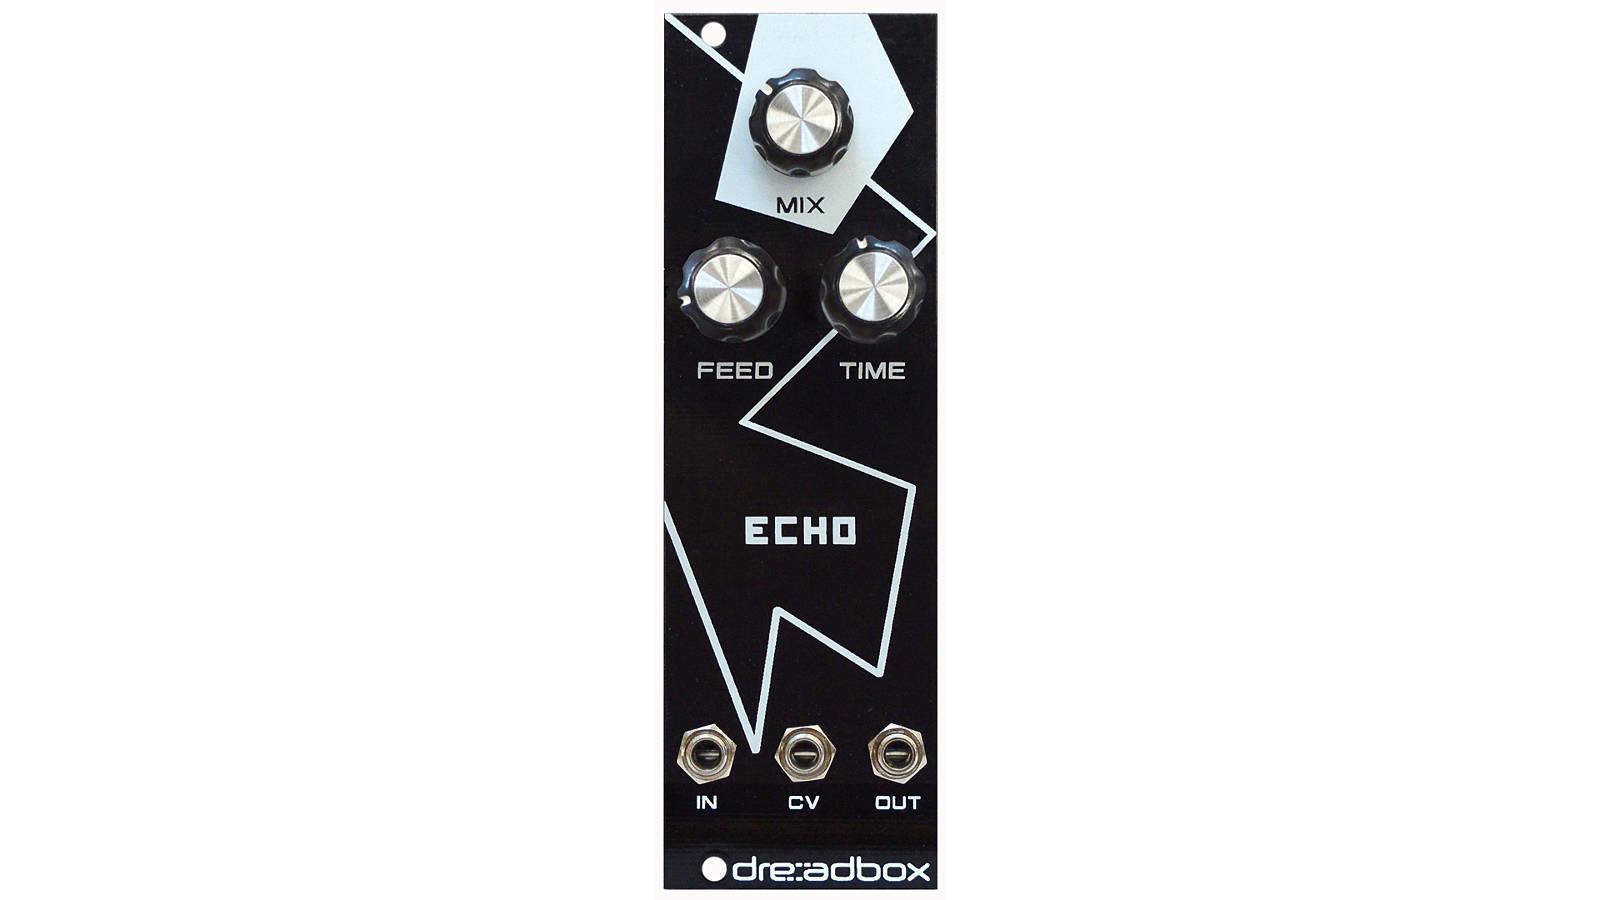 dreadbox White Line Echo Modular